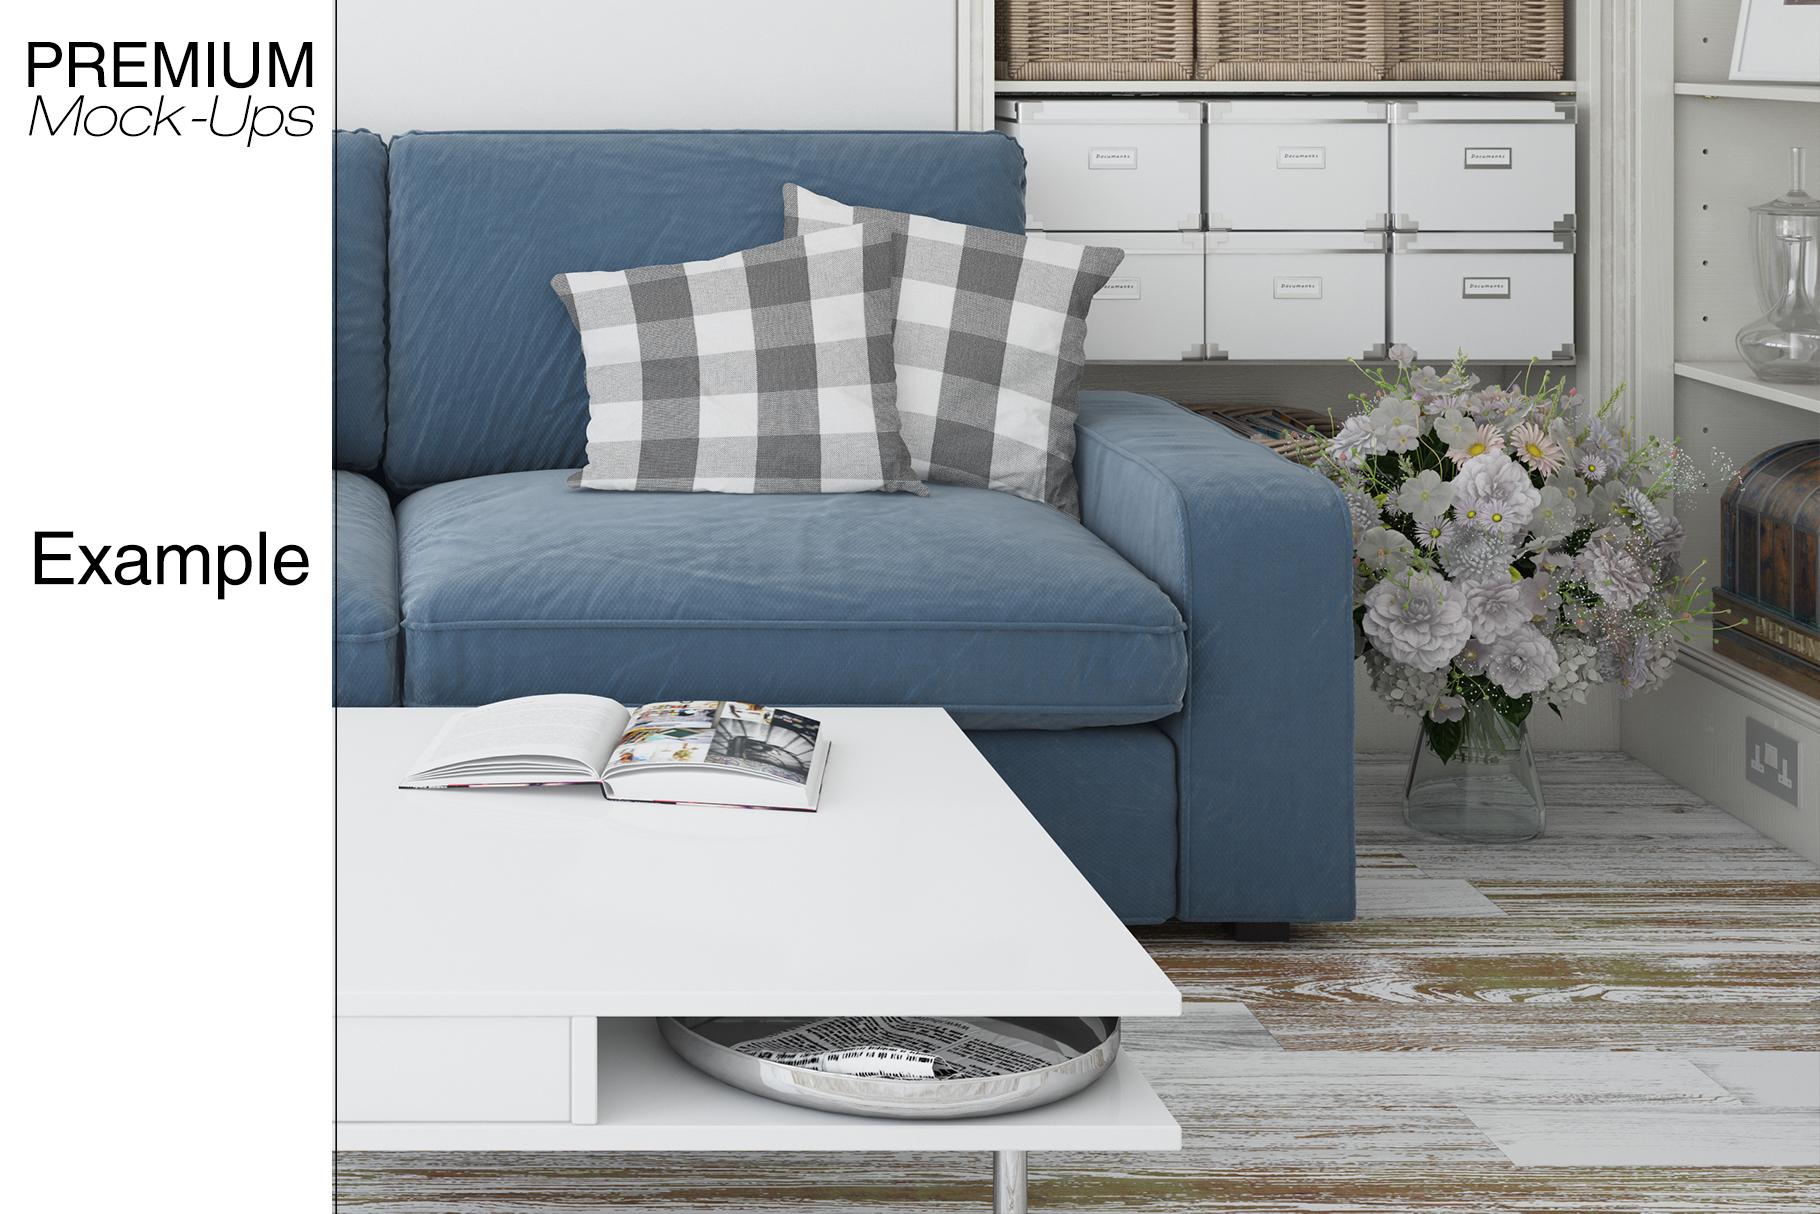 Pillows & Frames Mockup Set example image 16